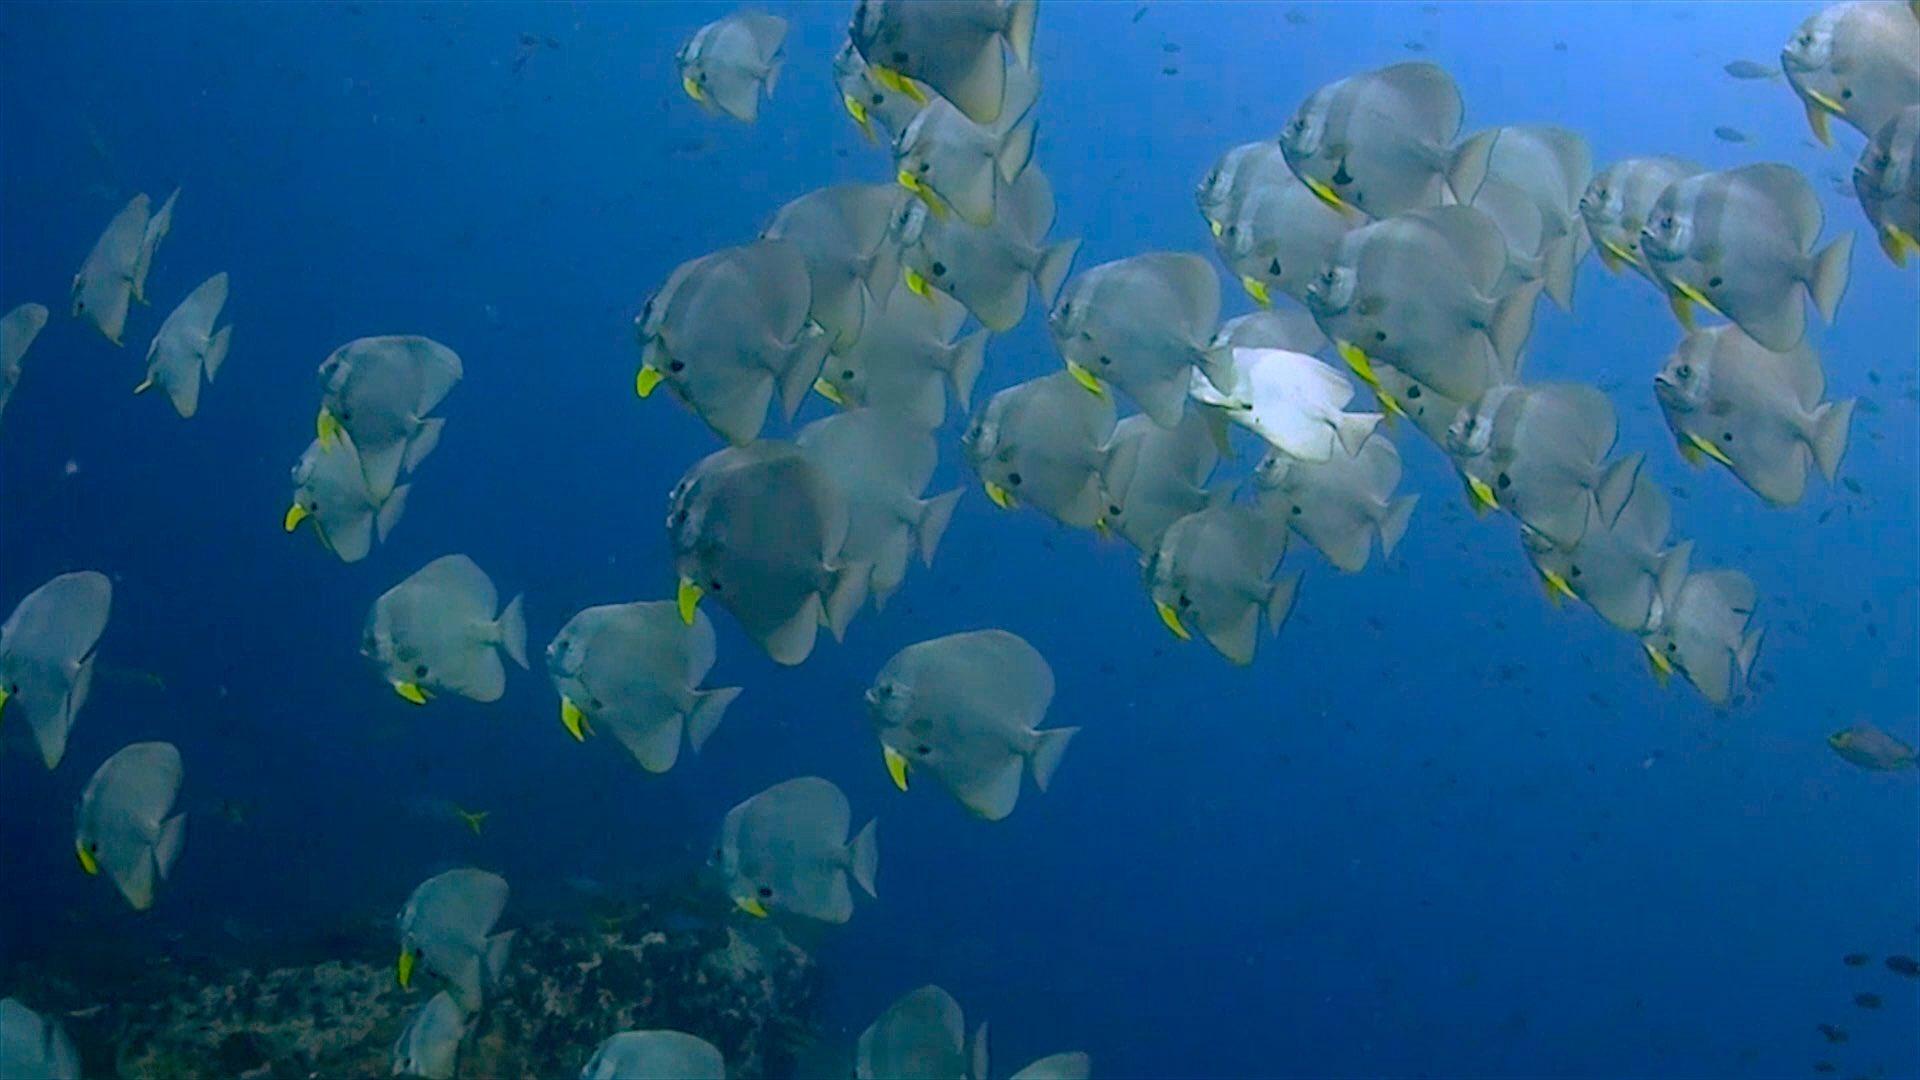 www.thefunkyturtle.com chumphon dive site koh tao batfish